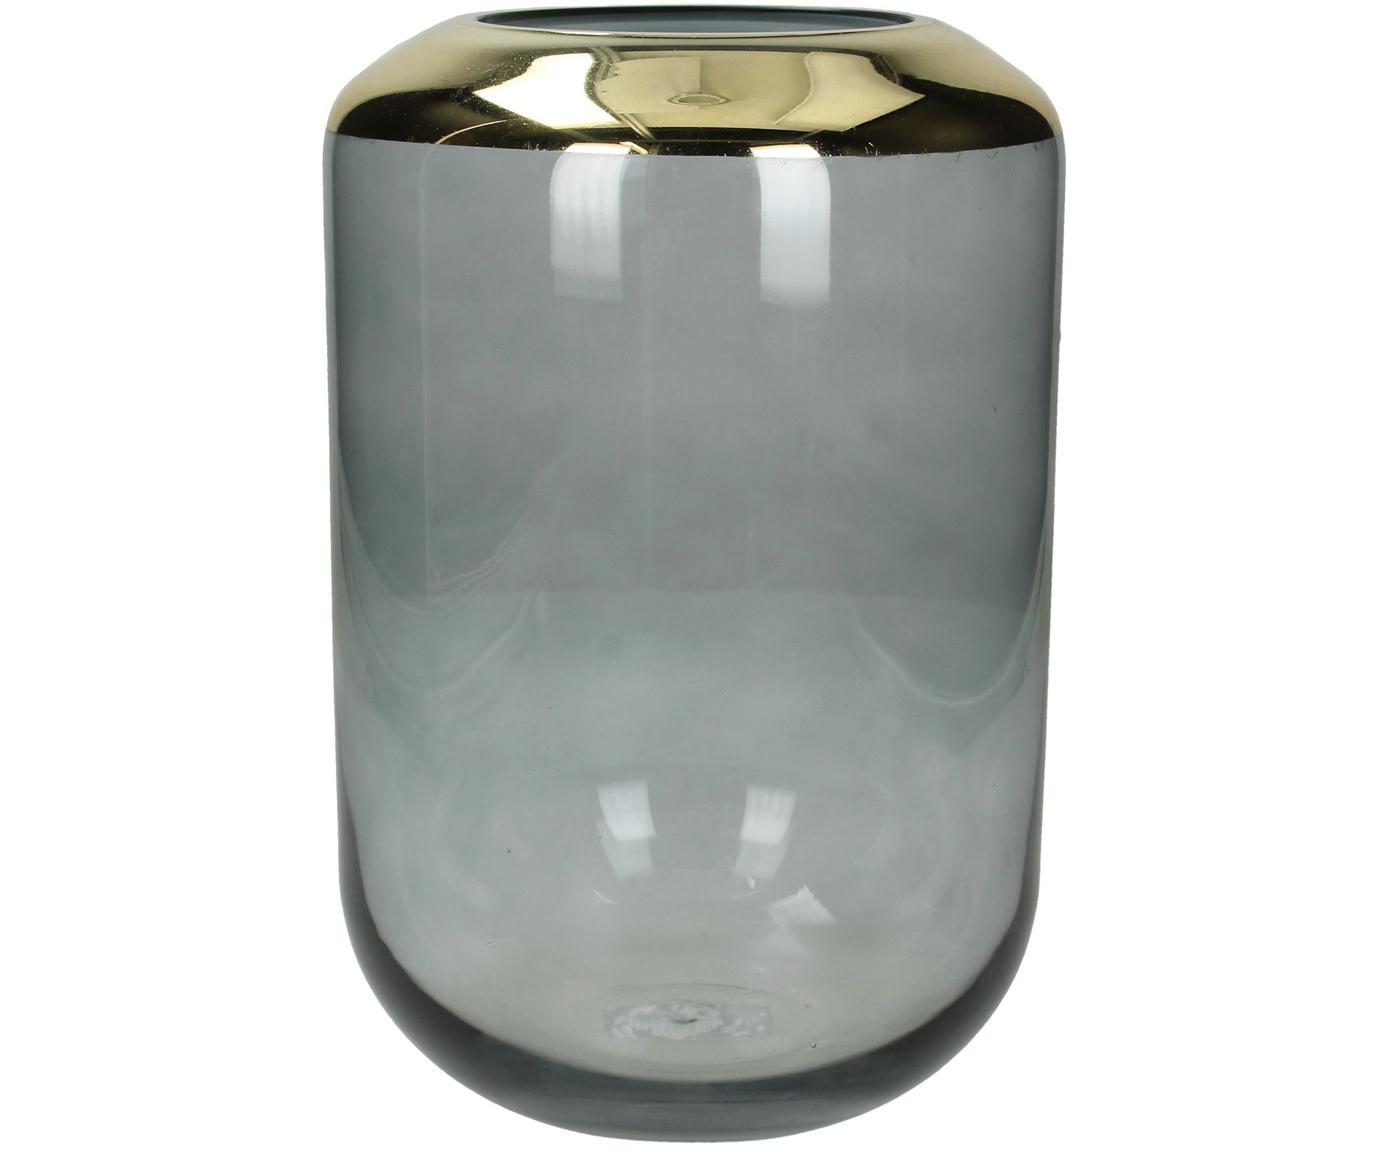 Glas-Vase Janak, Glas, Grau, transparent, Goldfarben, Ø 16 x H 25 cm